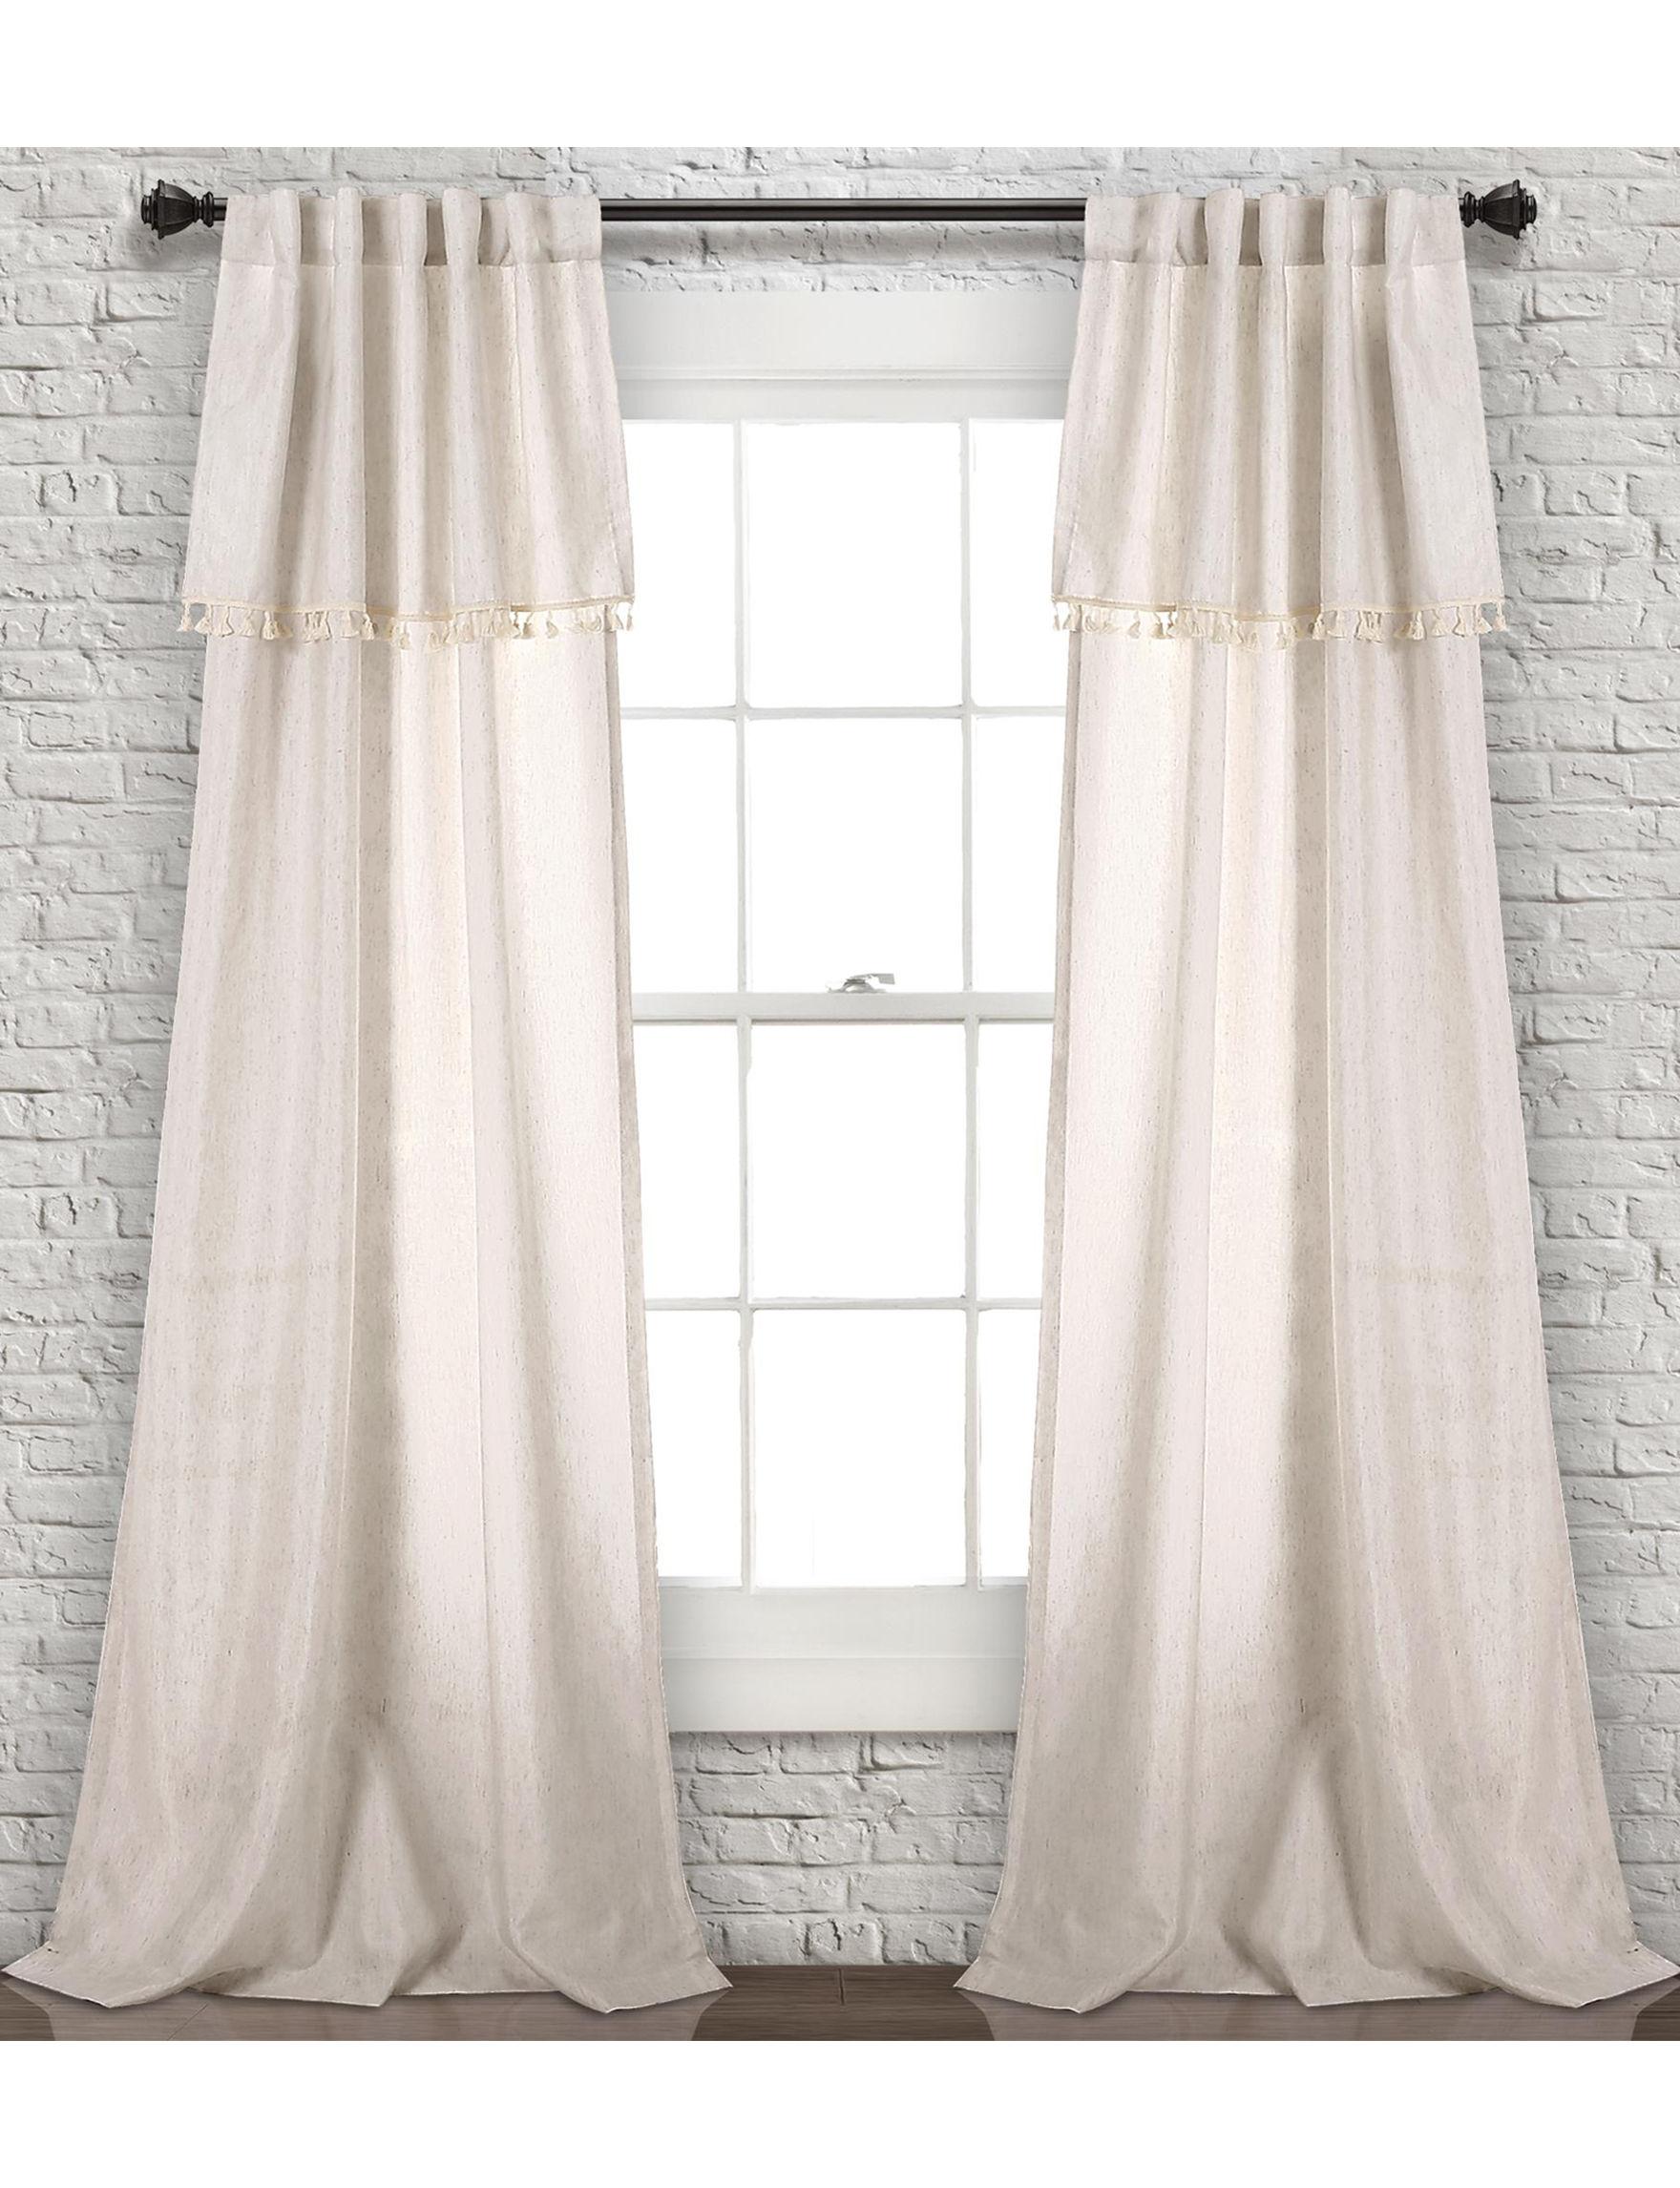 Lush Decor Beige Curtains & Drapes Window Treatments